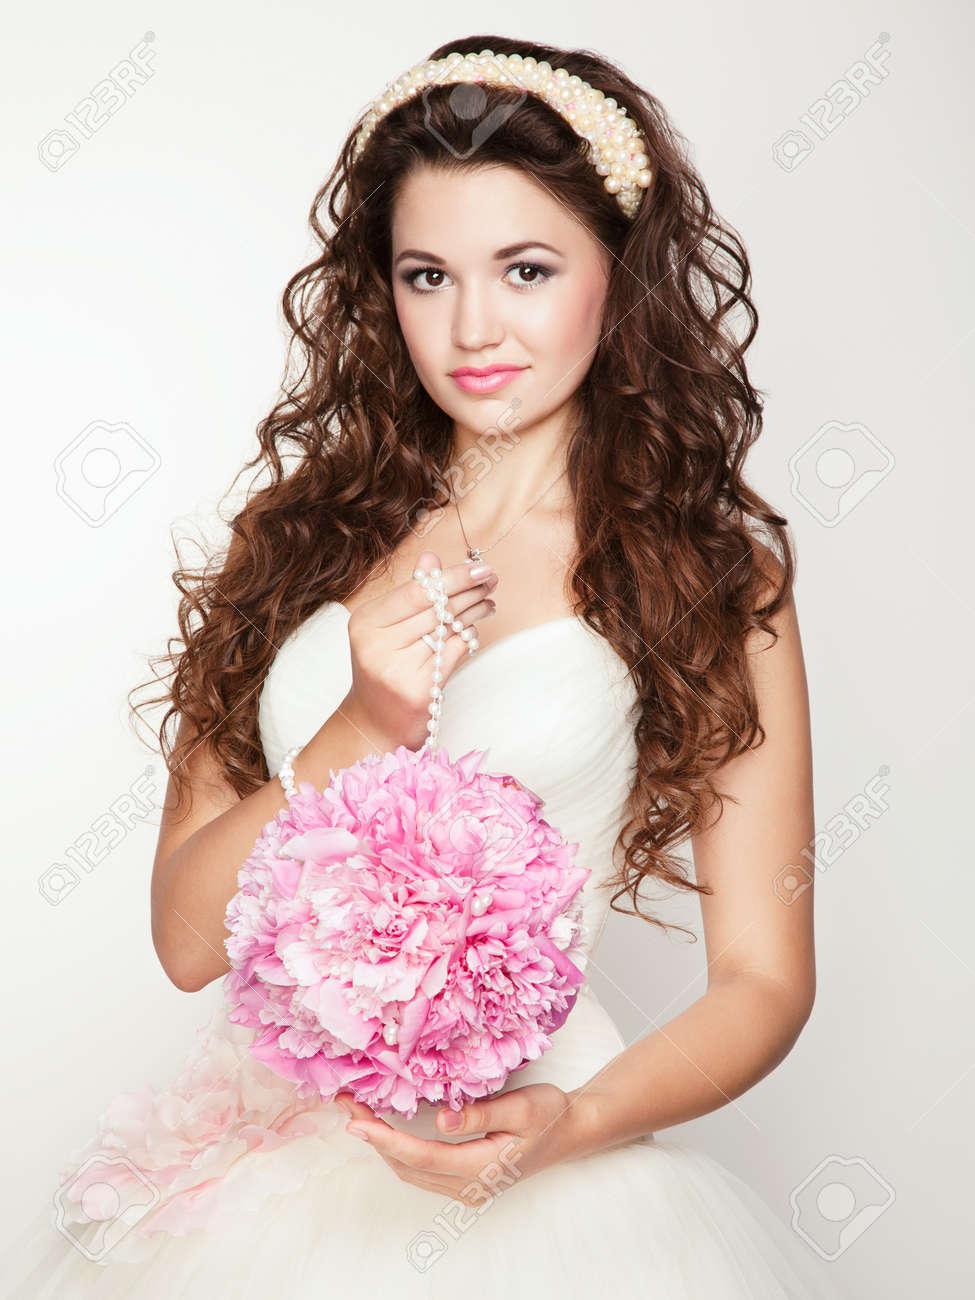 Прически на свадьбу для квадратного лица фото